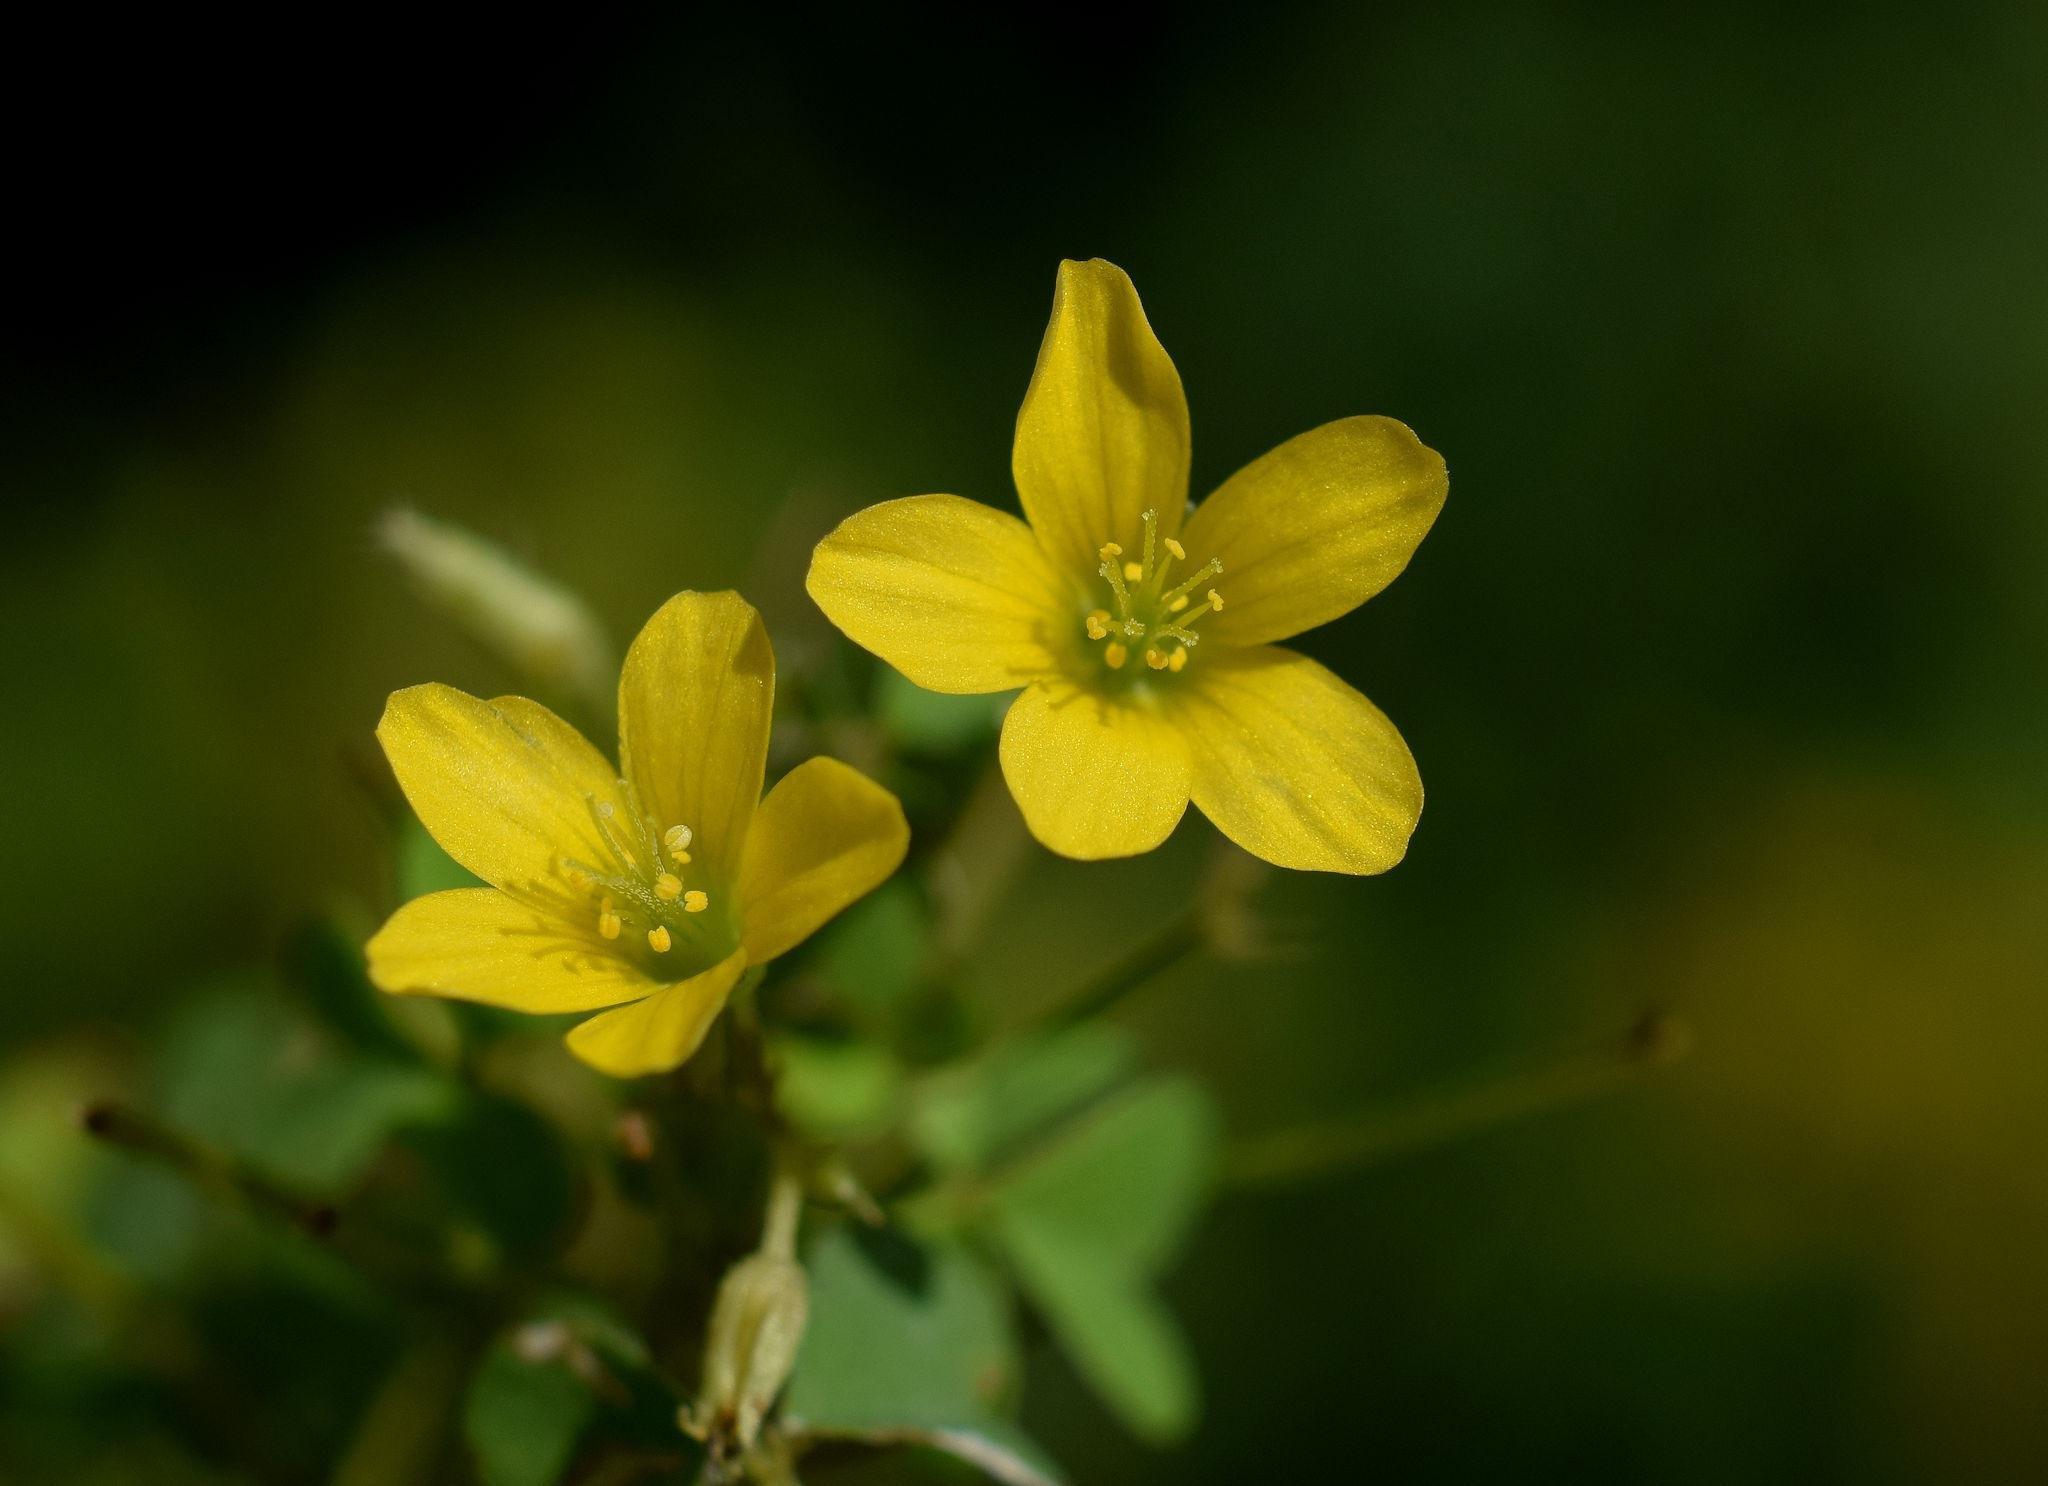 Wildflower or Weed by wiseacre